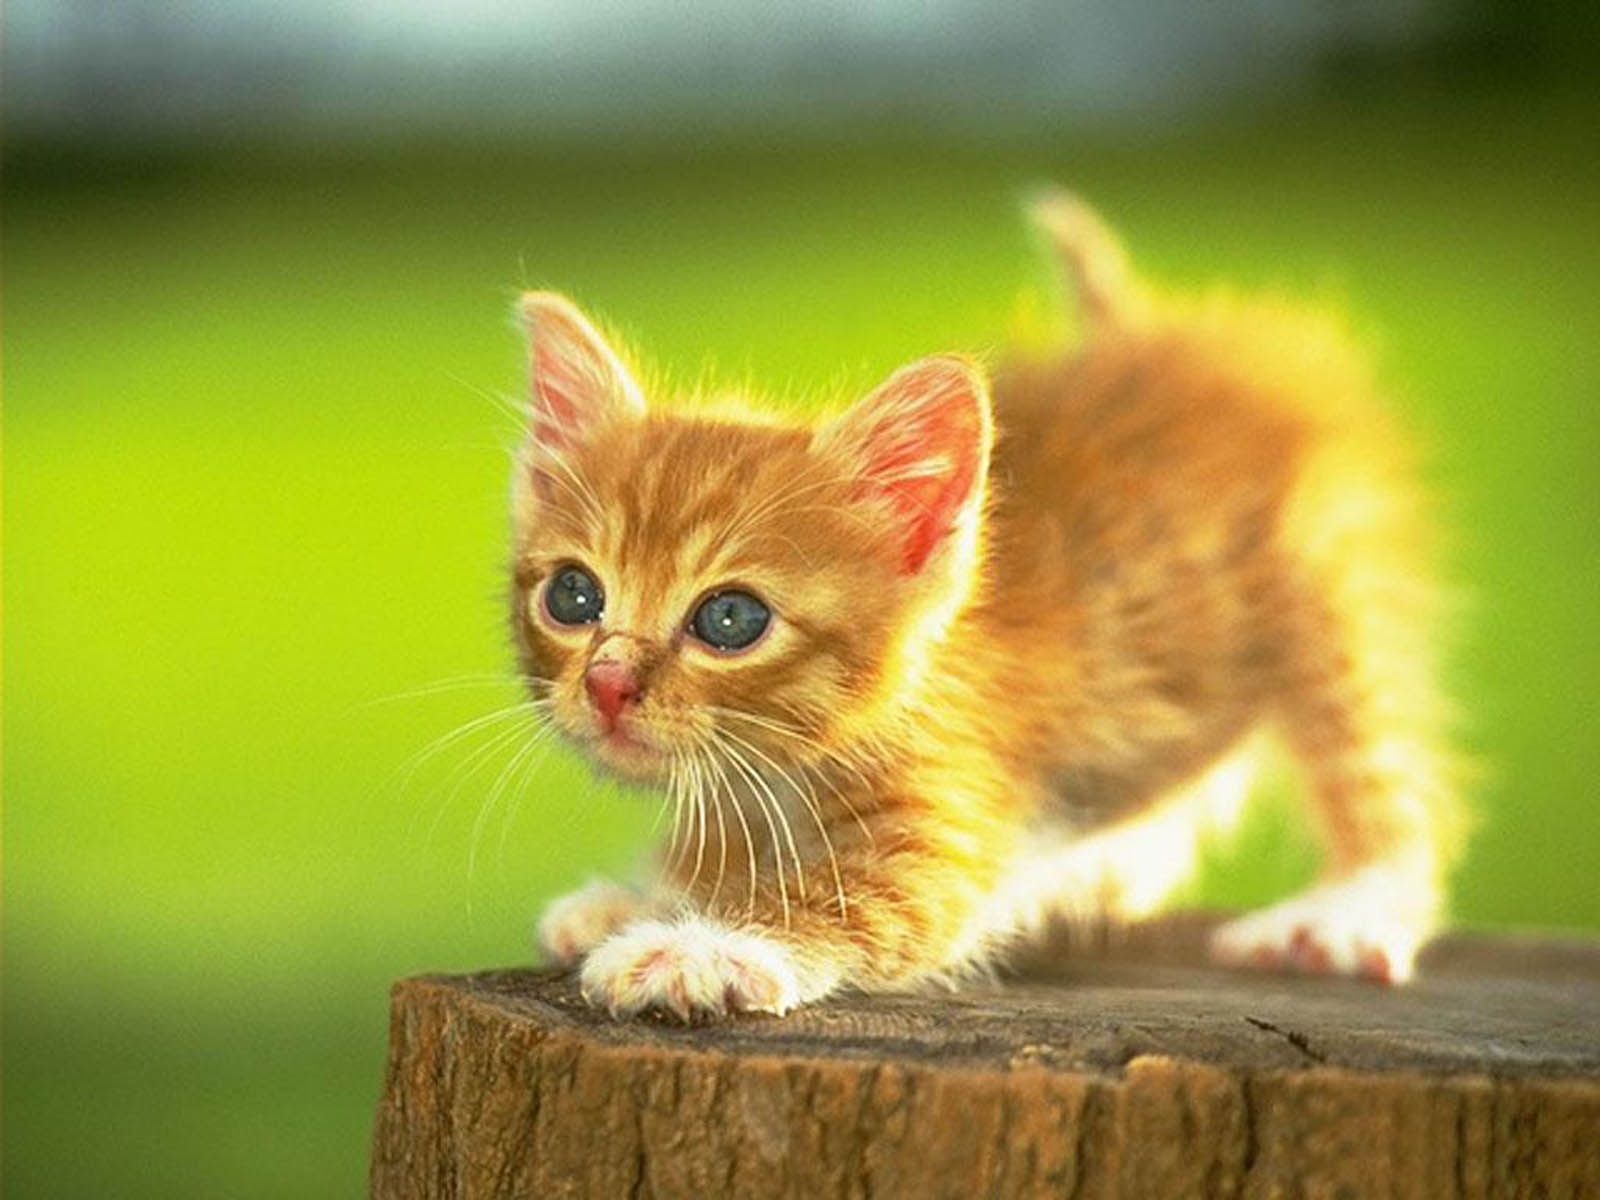 Hunting cat wallpapers desktop wallpaper - Caterpillar wallpaper ...